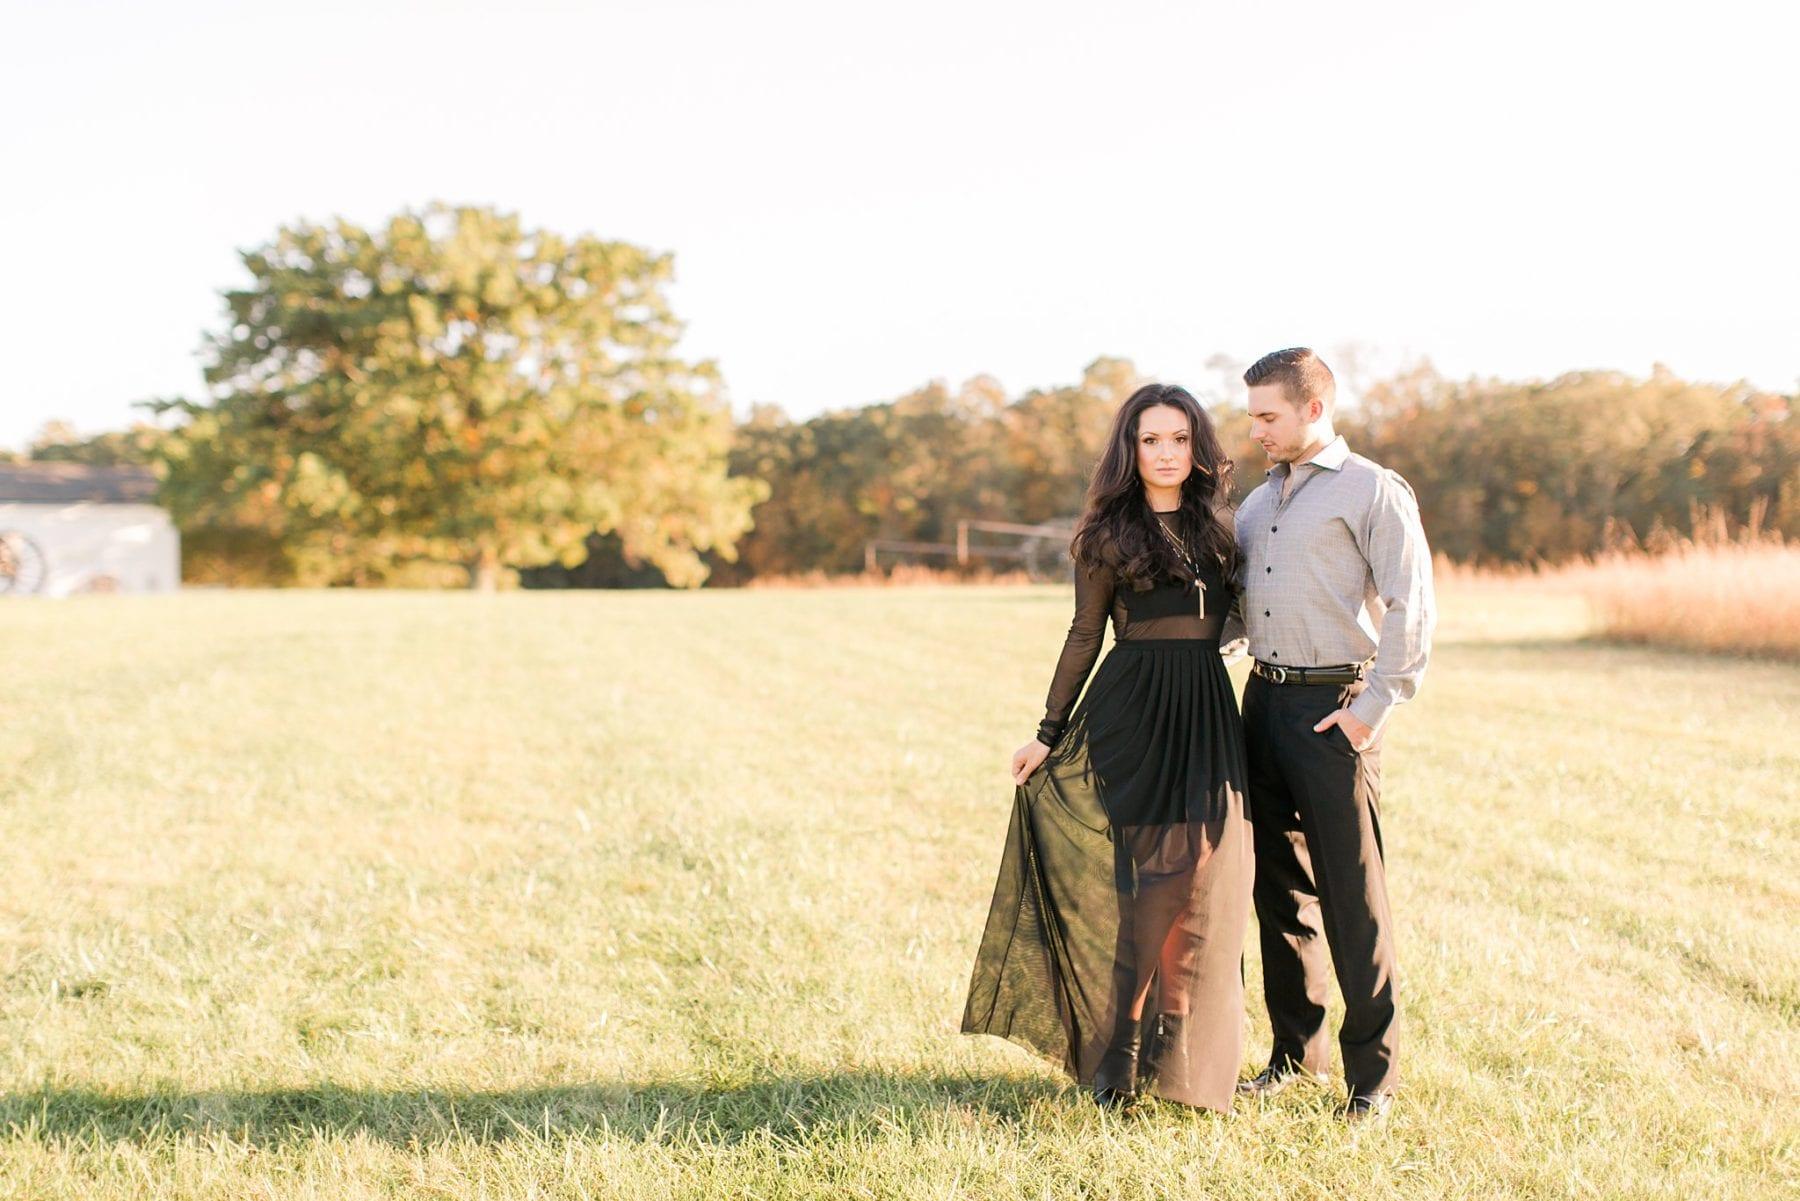 Manassas Battlefield Portraits Virginia Wedding Photographer Megan Kelsey Photography Lianne & Chris-84.jpg